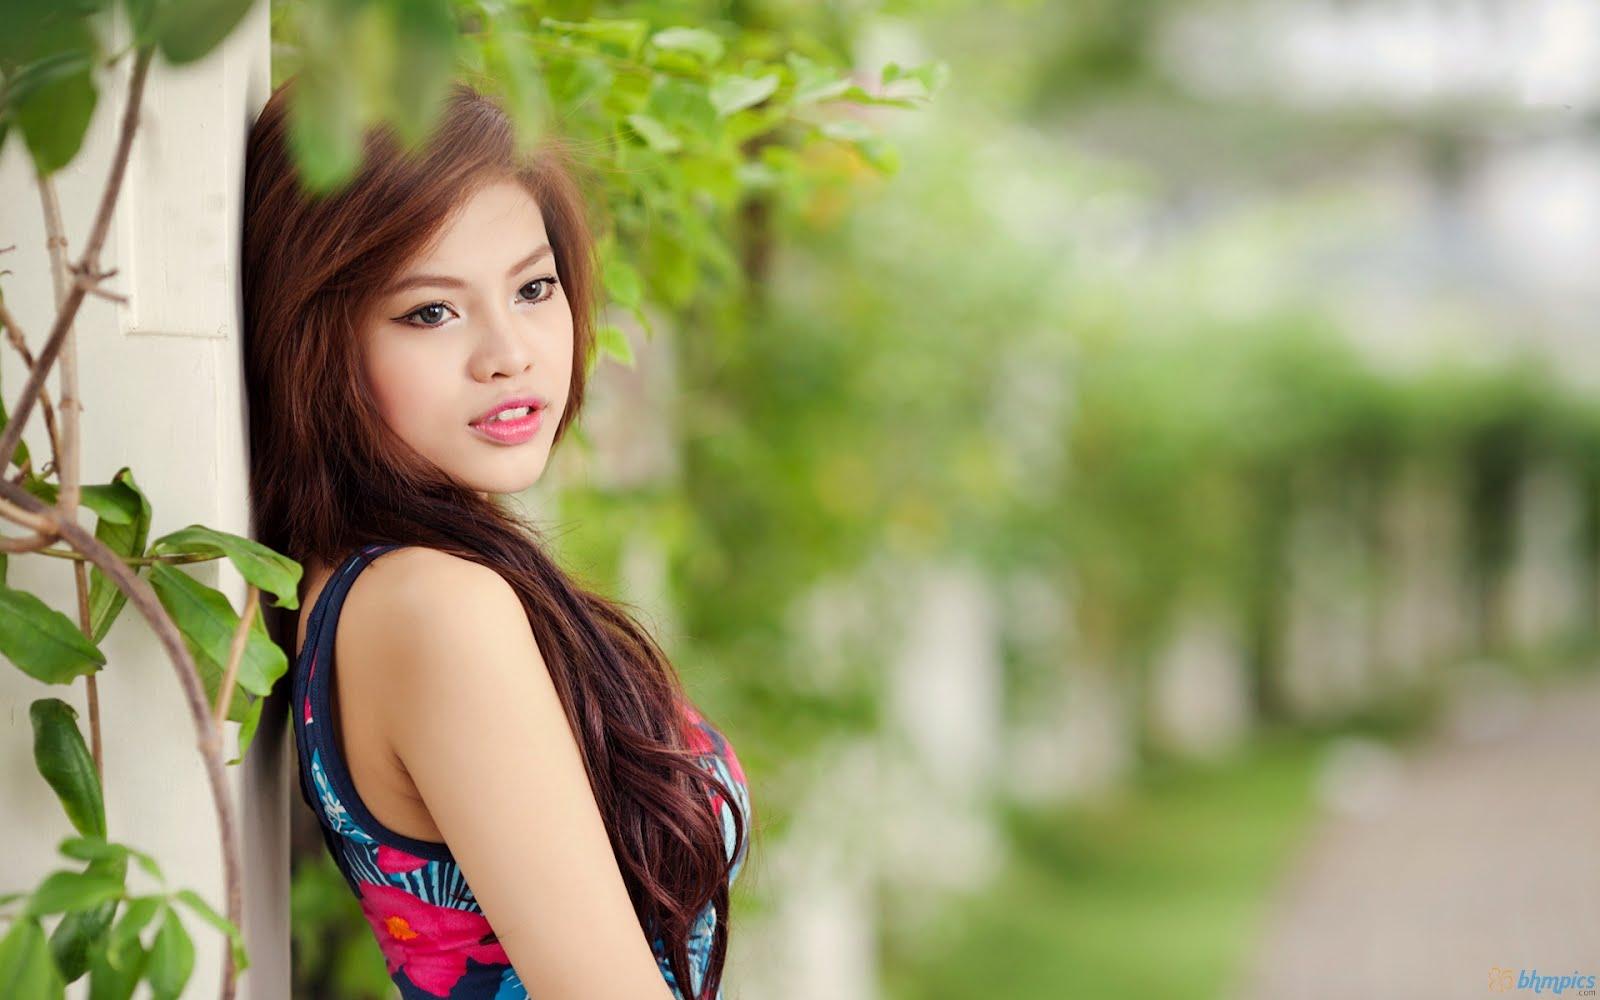 HD WALLPAPERS FOR DESKTOP nice beautiful girl face 1600x1000